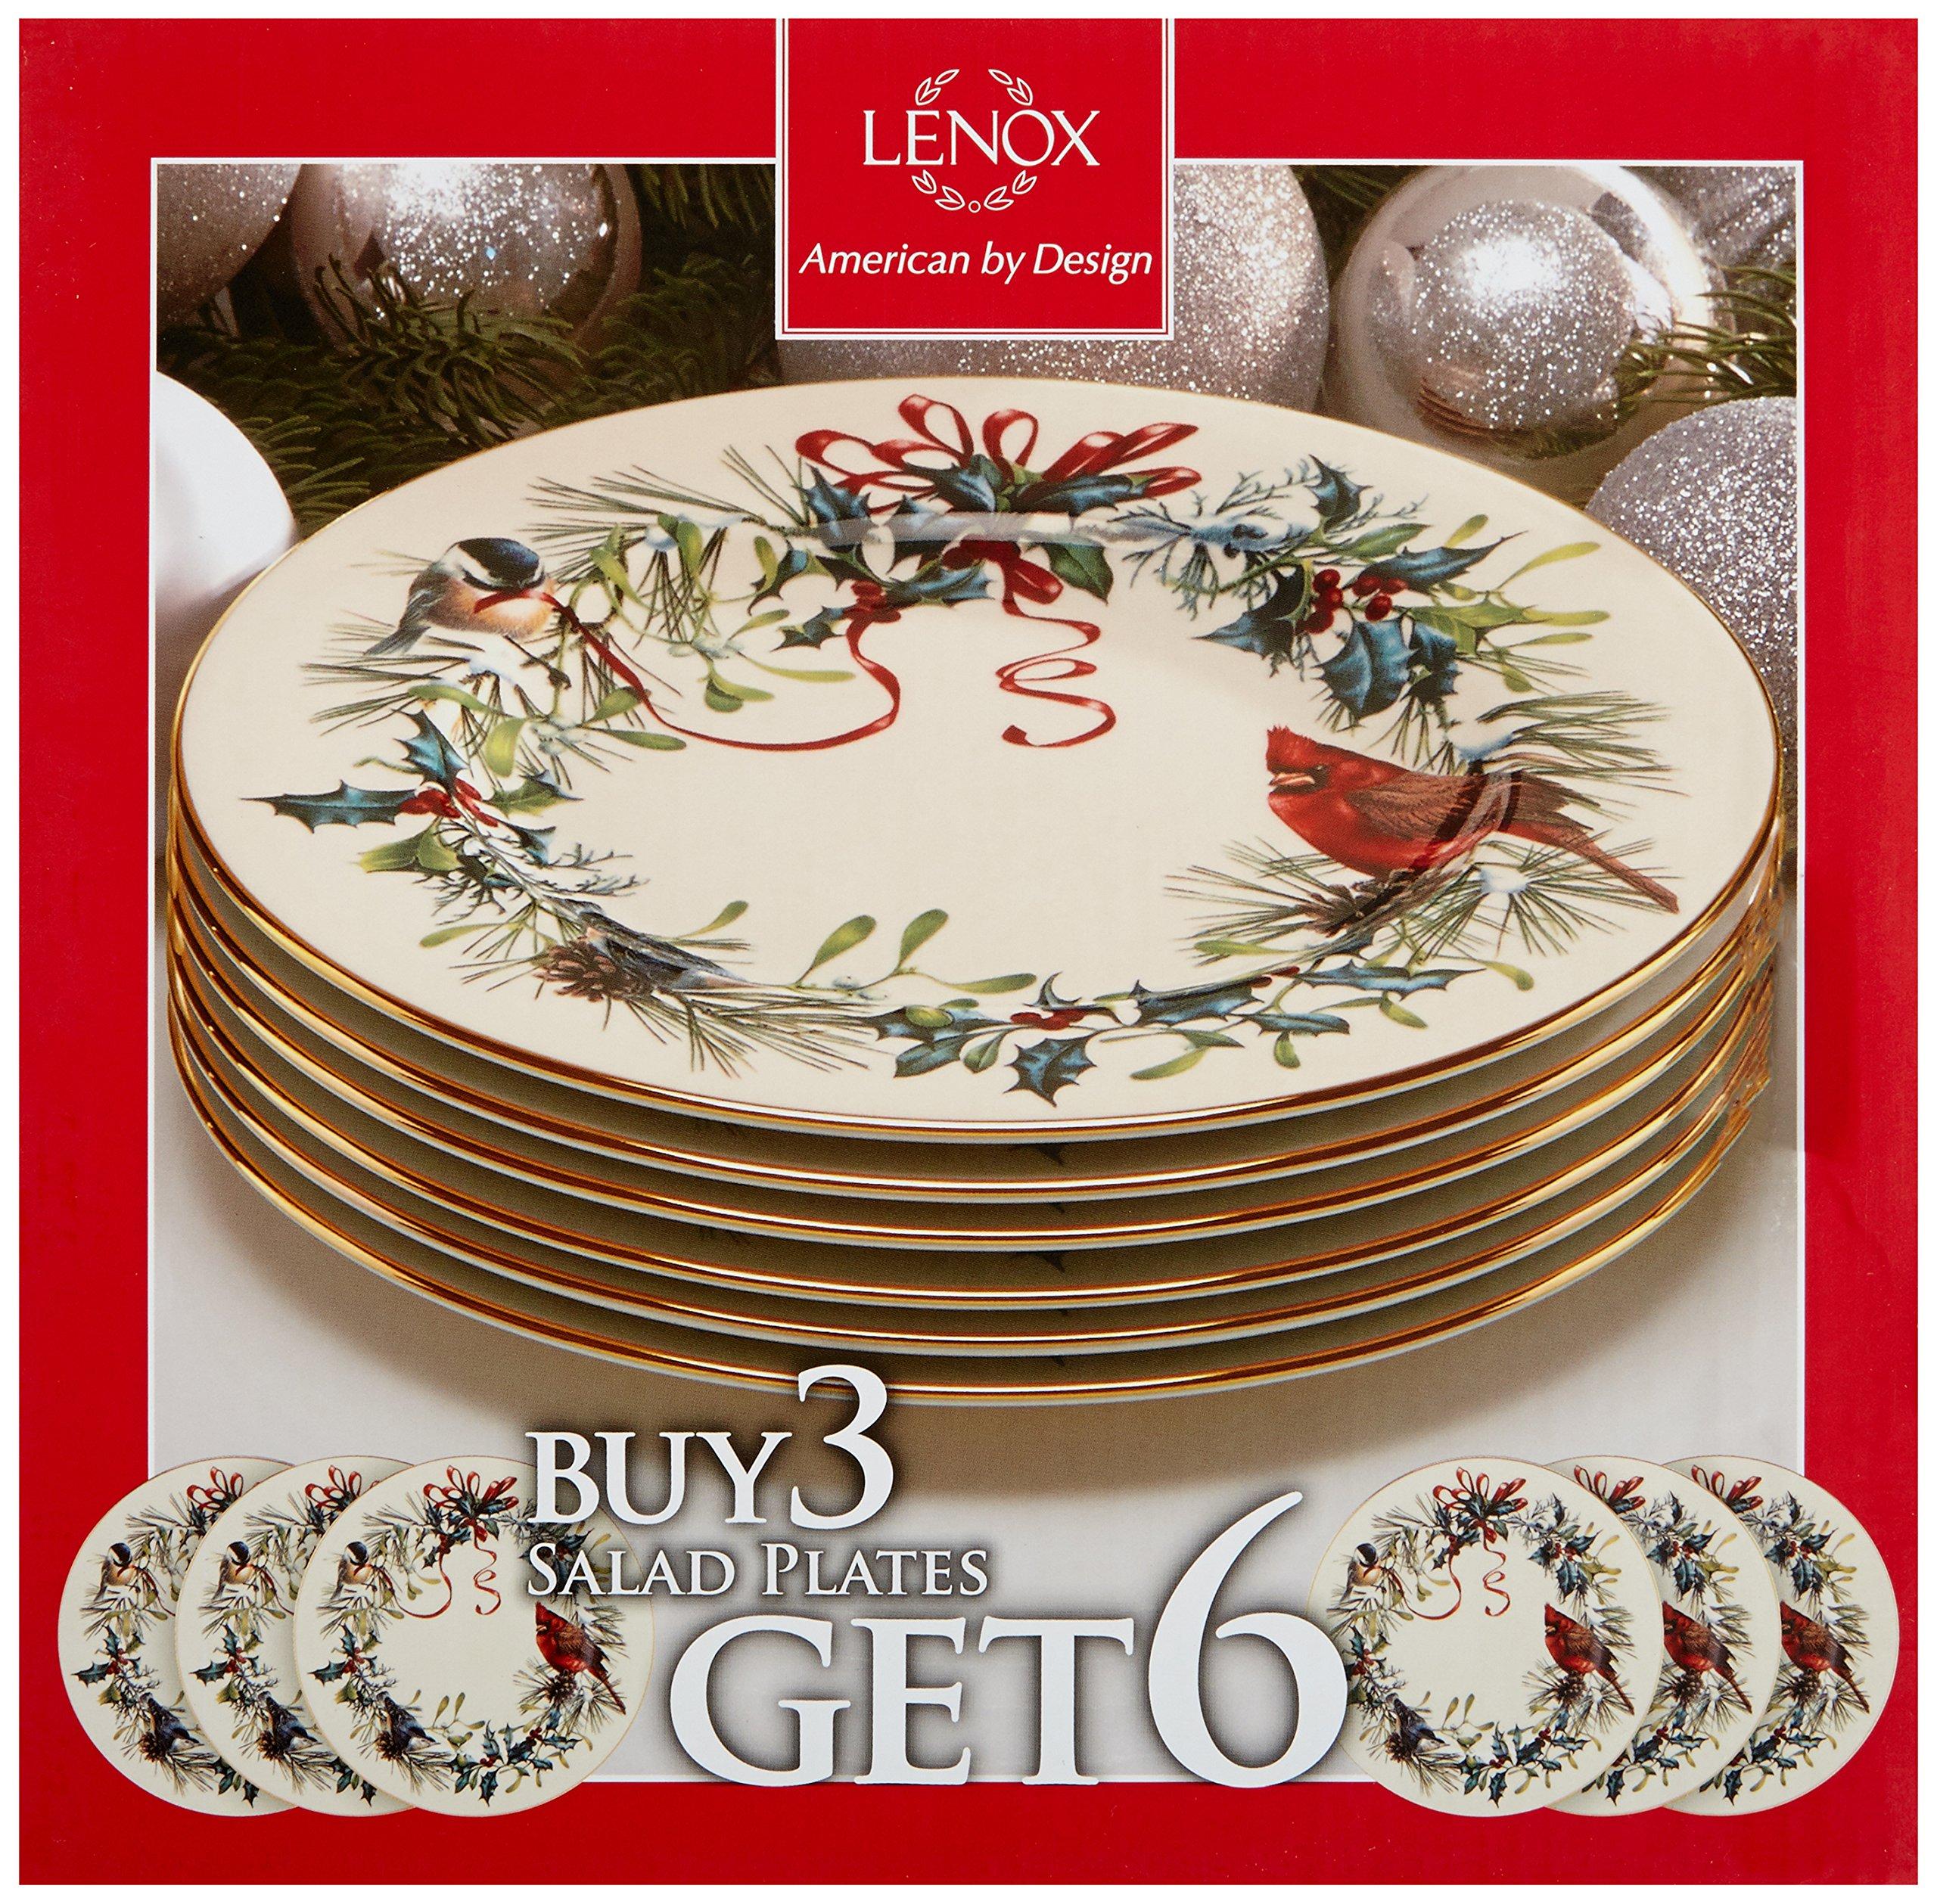 Lenox Winter Greetings Set of 6 Salad Plates,Ivory by Lenox (Image #2)